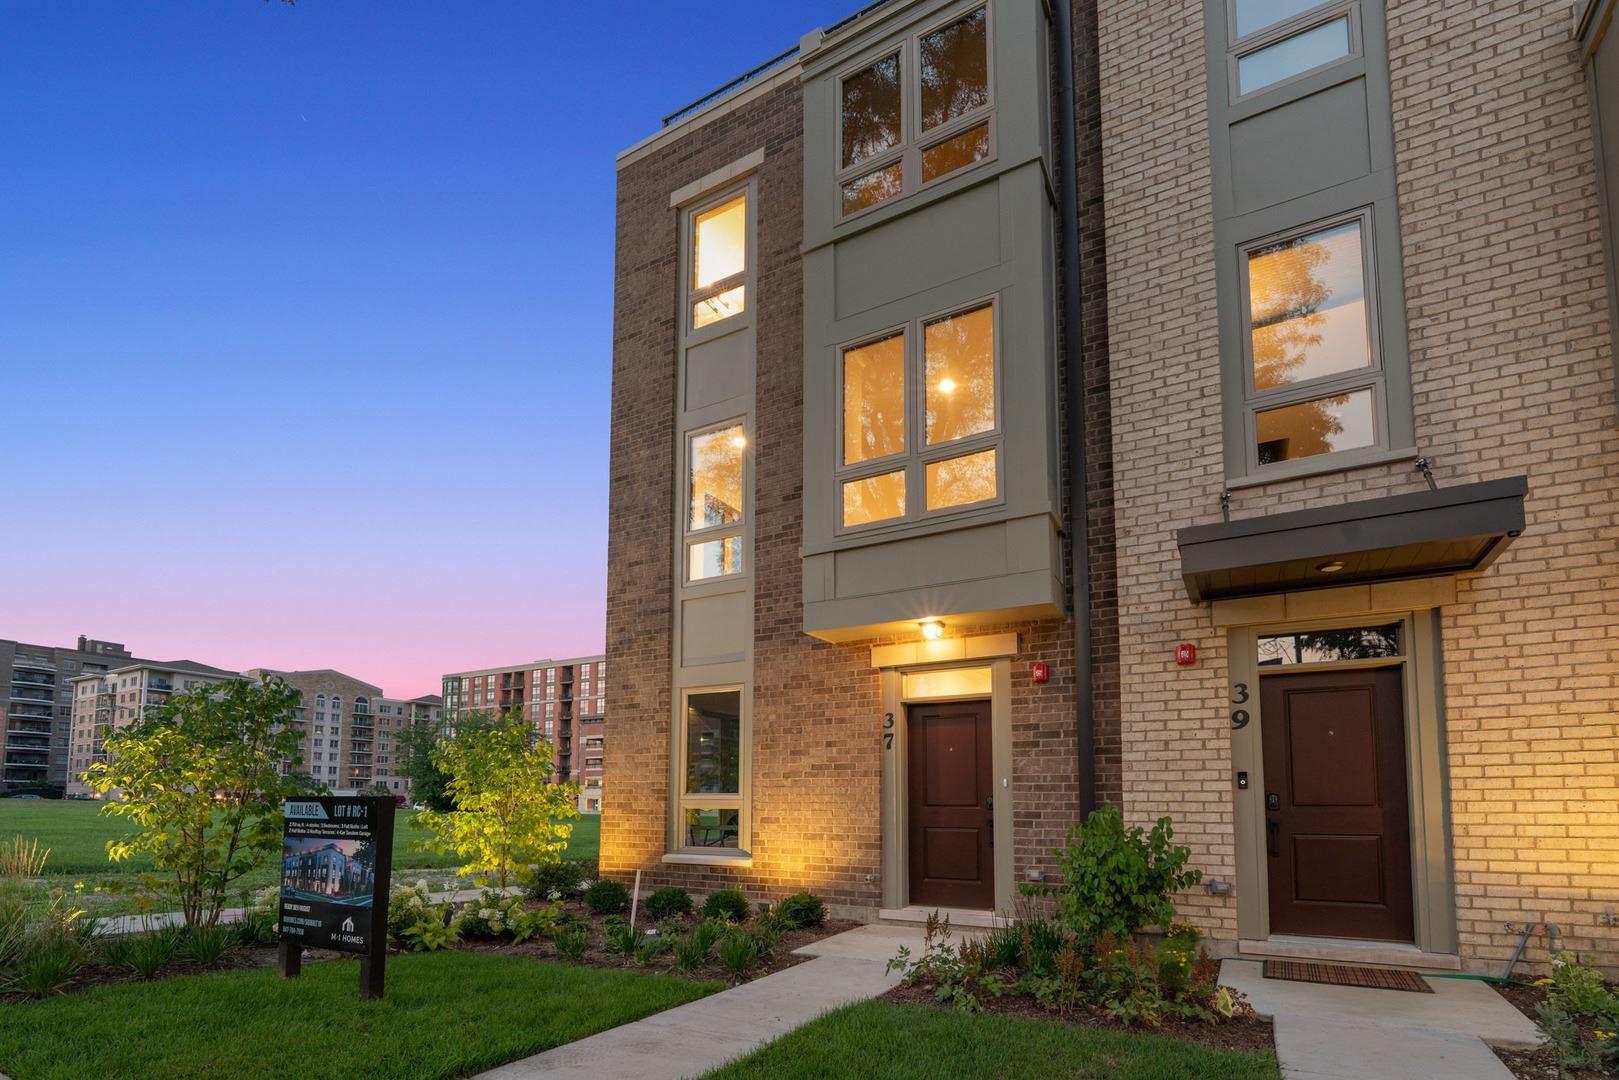 37 S Chestnut Lot #1 Avenue, Arlington Heights, IL 60005 - #: 11178918